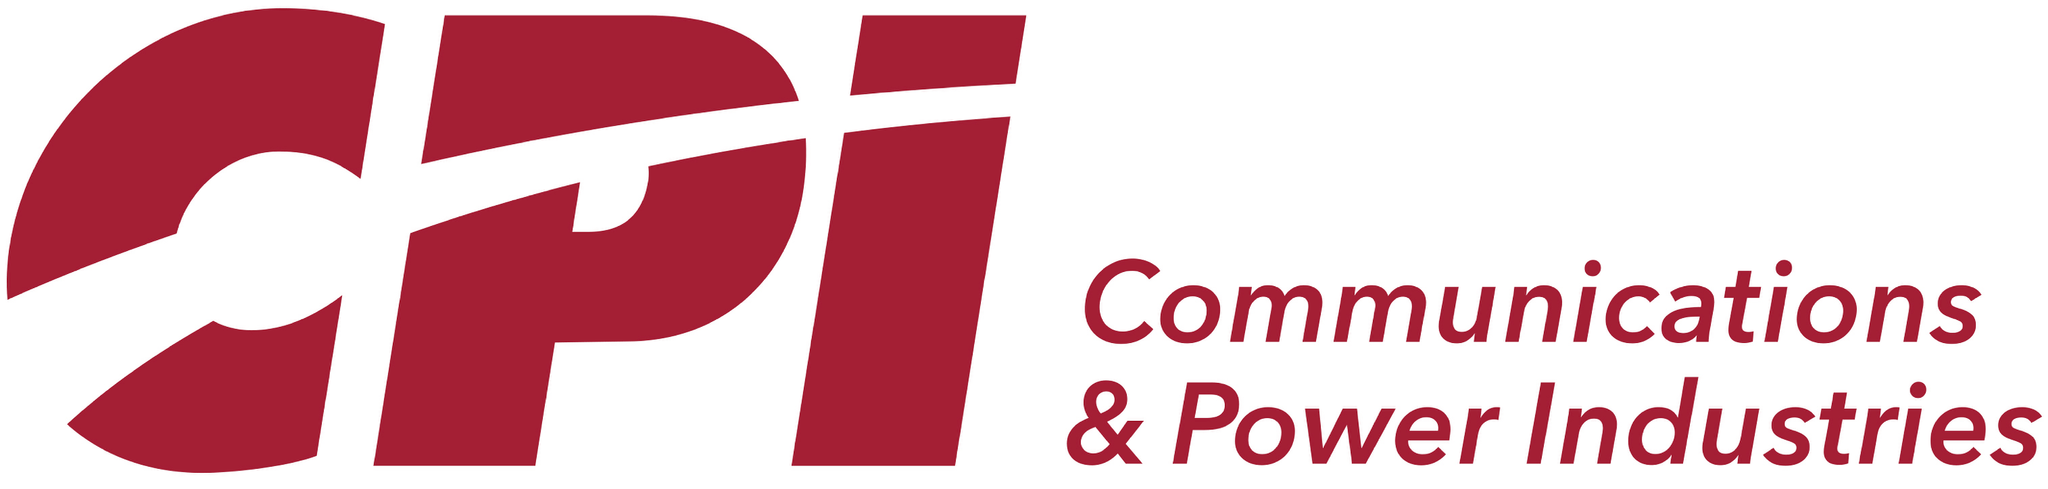 Communications & Power Industries Europe Ltd